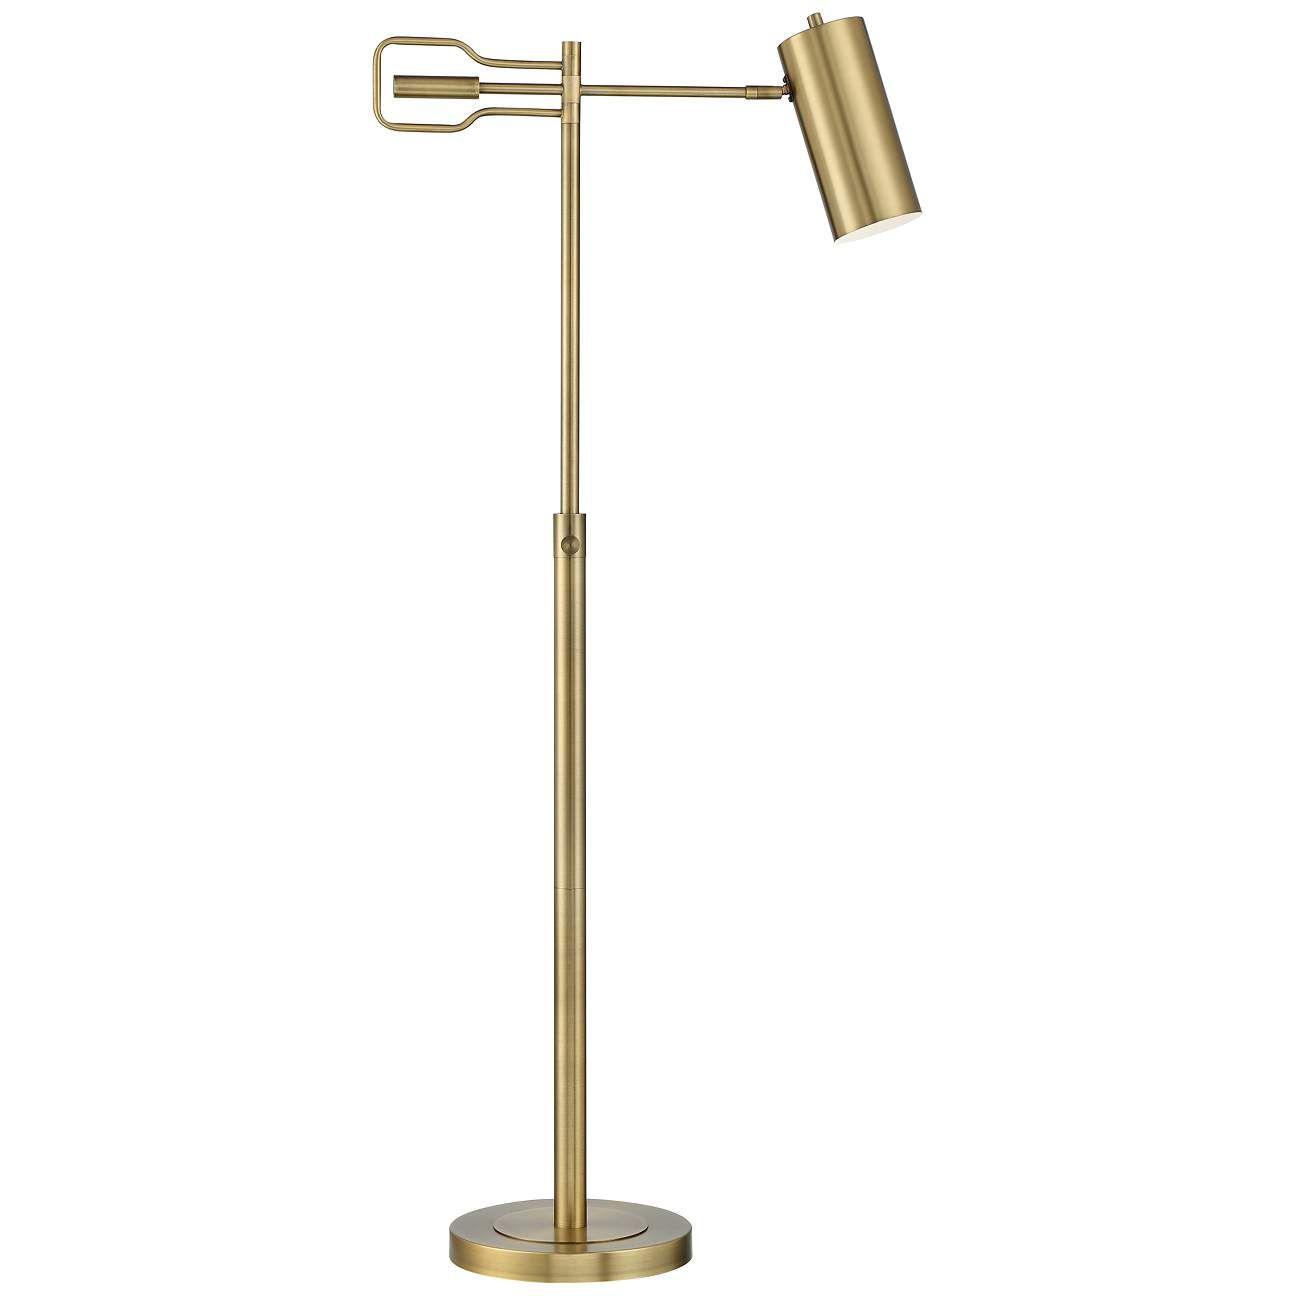 Kaylie Brass Finish Adjustable Task Reading Floor Lamp 88g99 Lamps Plus In 2021 Reading Lamp Floor Floor Lamp Lamp Reading floor lamps adjustable